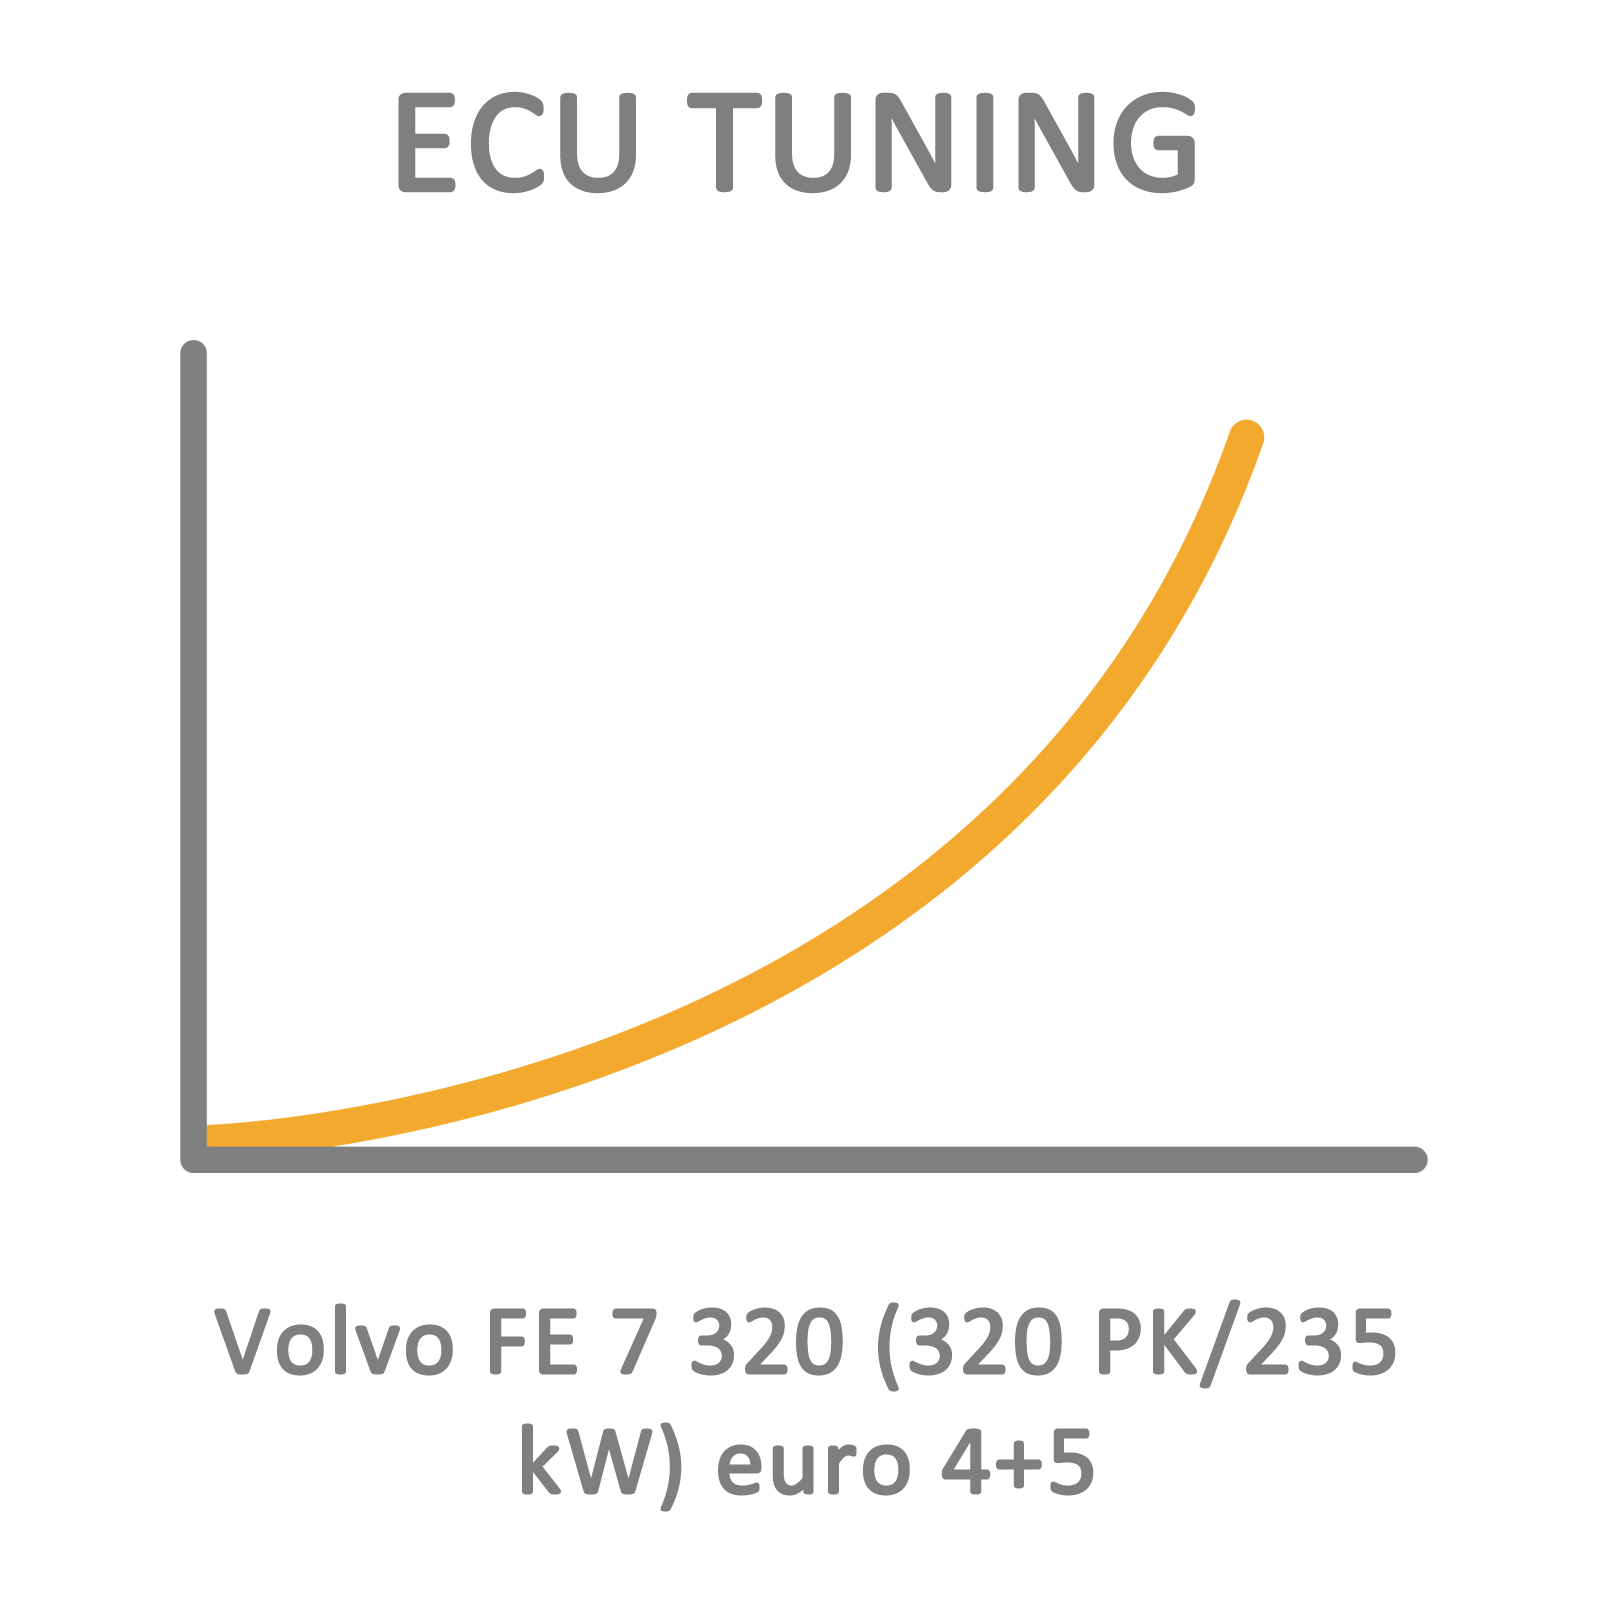 Volvo Fe 7 320 320 Pk 235 Kw Euro 4 5 Ecu Tuning